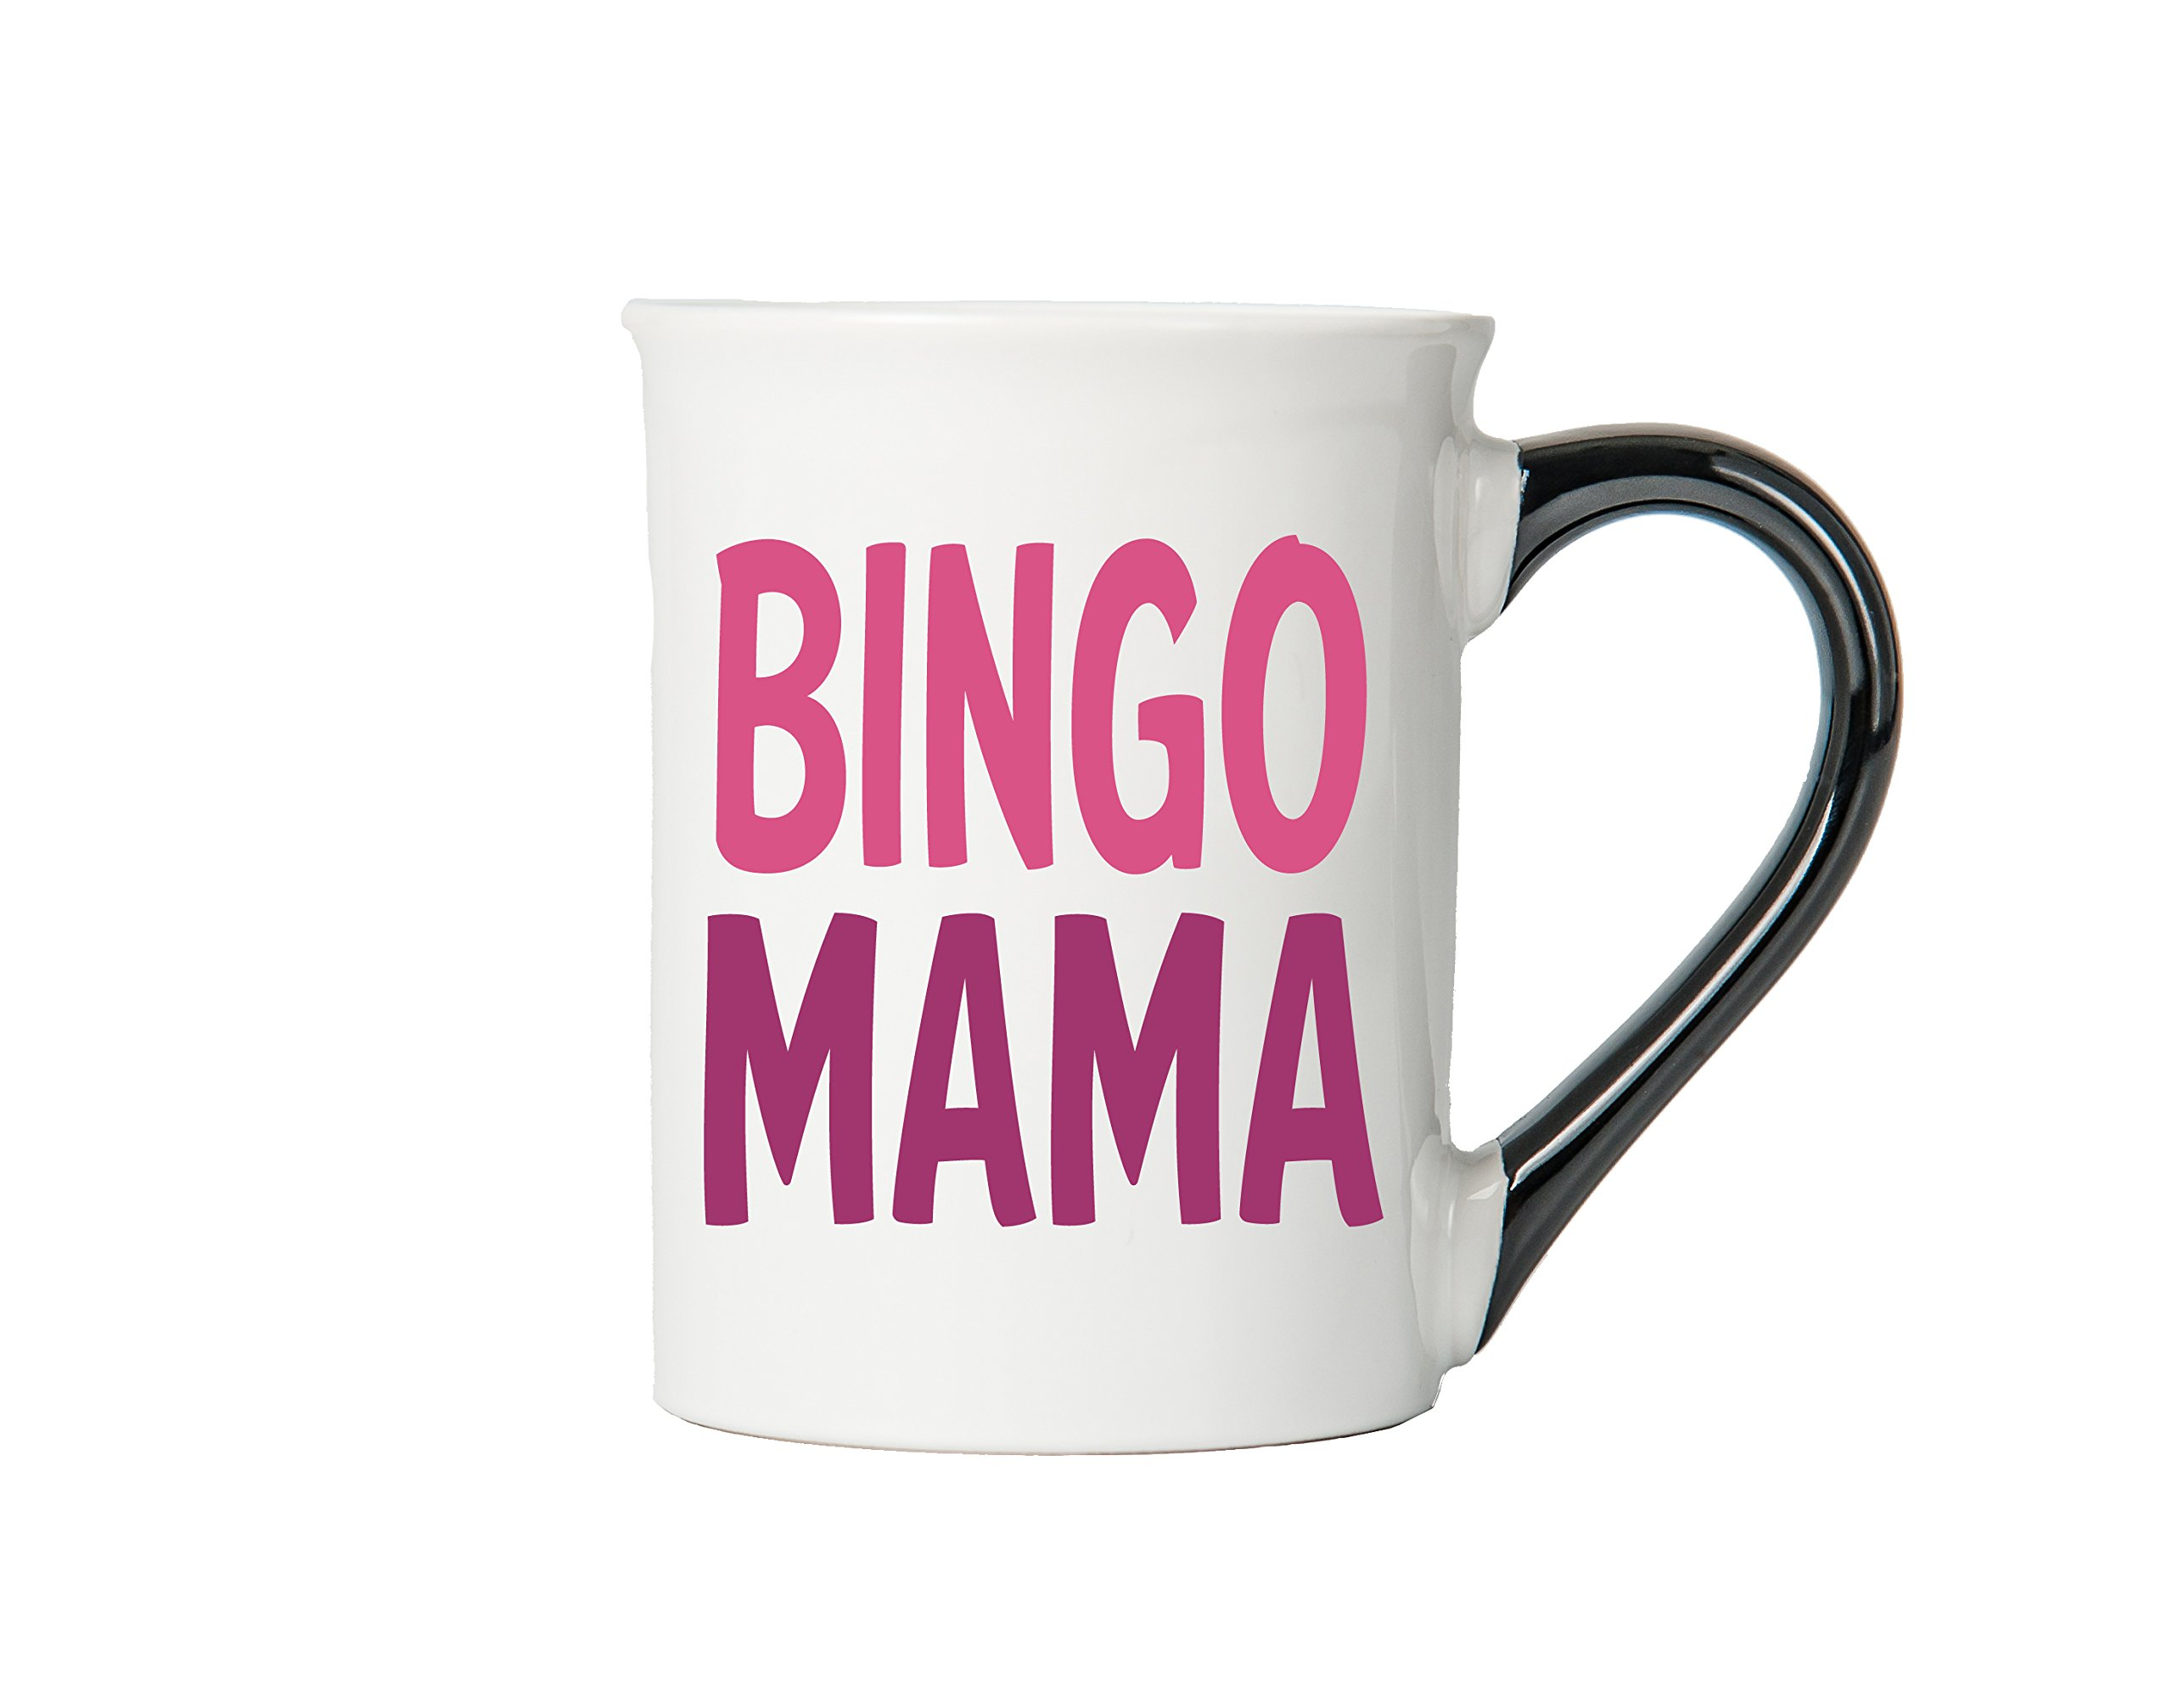 Bingo Mama Mug, Bingo Mama Coffee Cup, Ceramic Bingo Mama Mug, Custom Bingo Mama Gifts By Tumbleweed by Tumbleweed